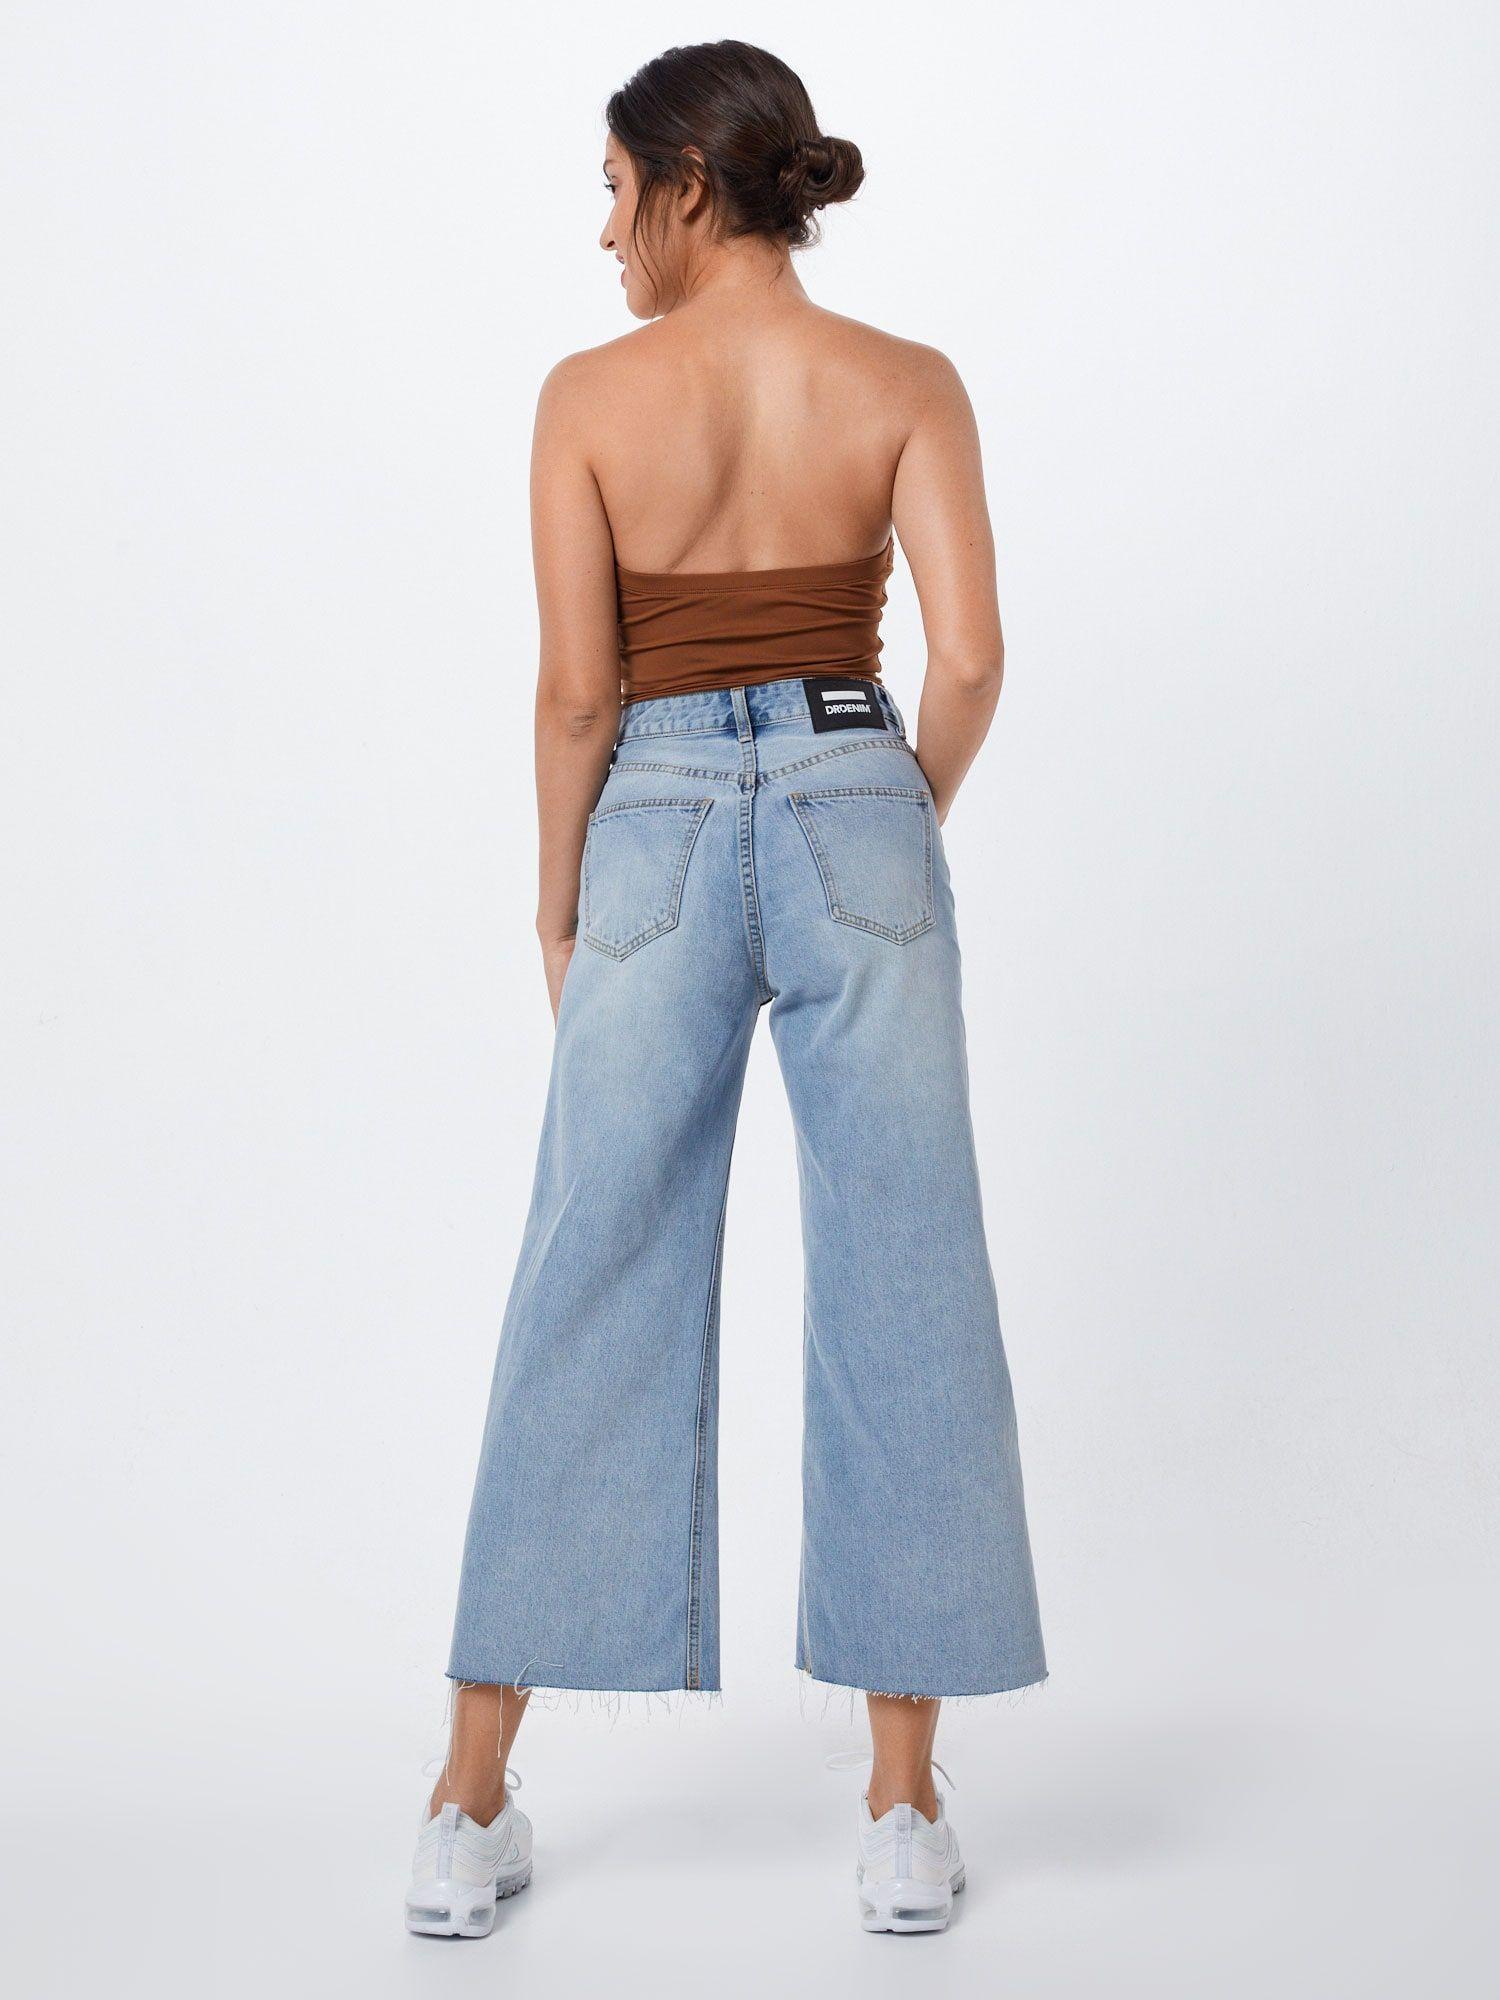 Dr. Denim Jeans 'Aiko' Damen, Blue Denim, Größe 30